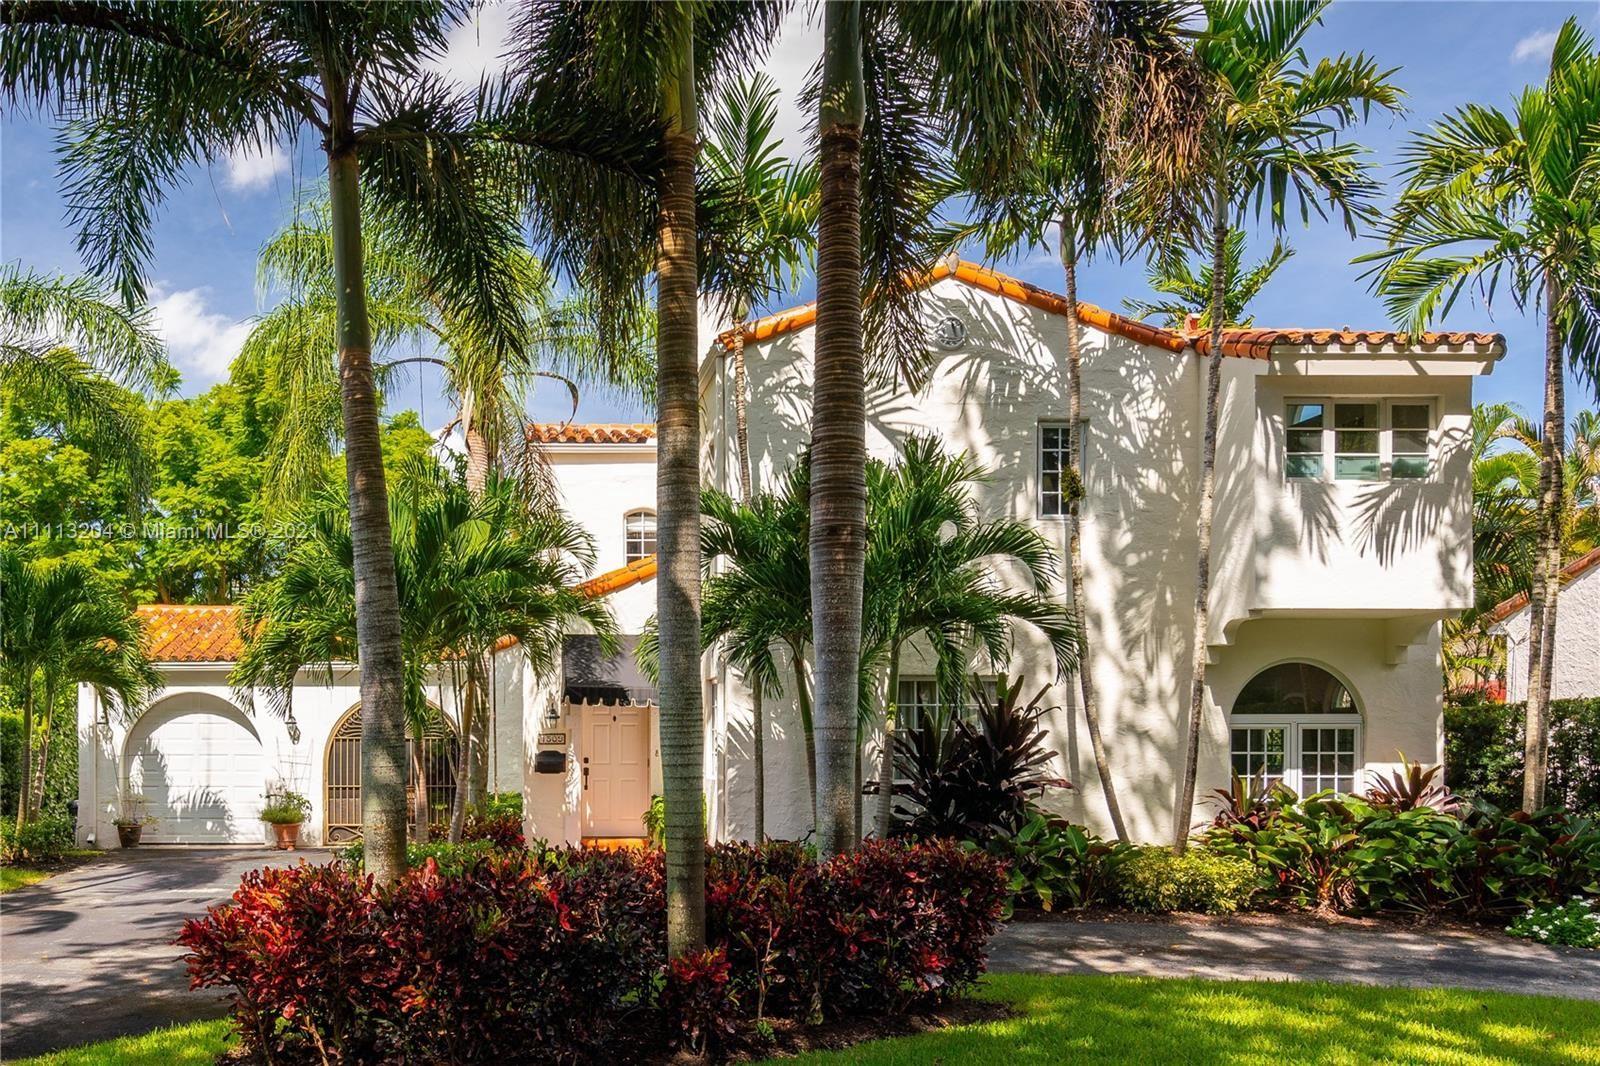 1509 Garcia Ave, Coral Gables, FL 33146 - #: A11113204